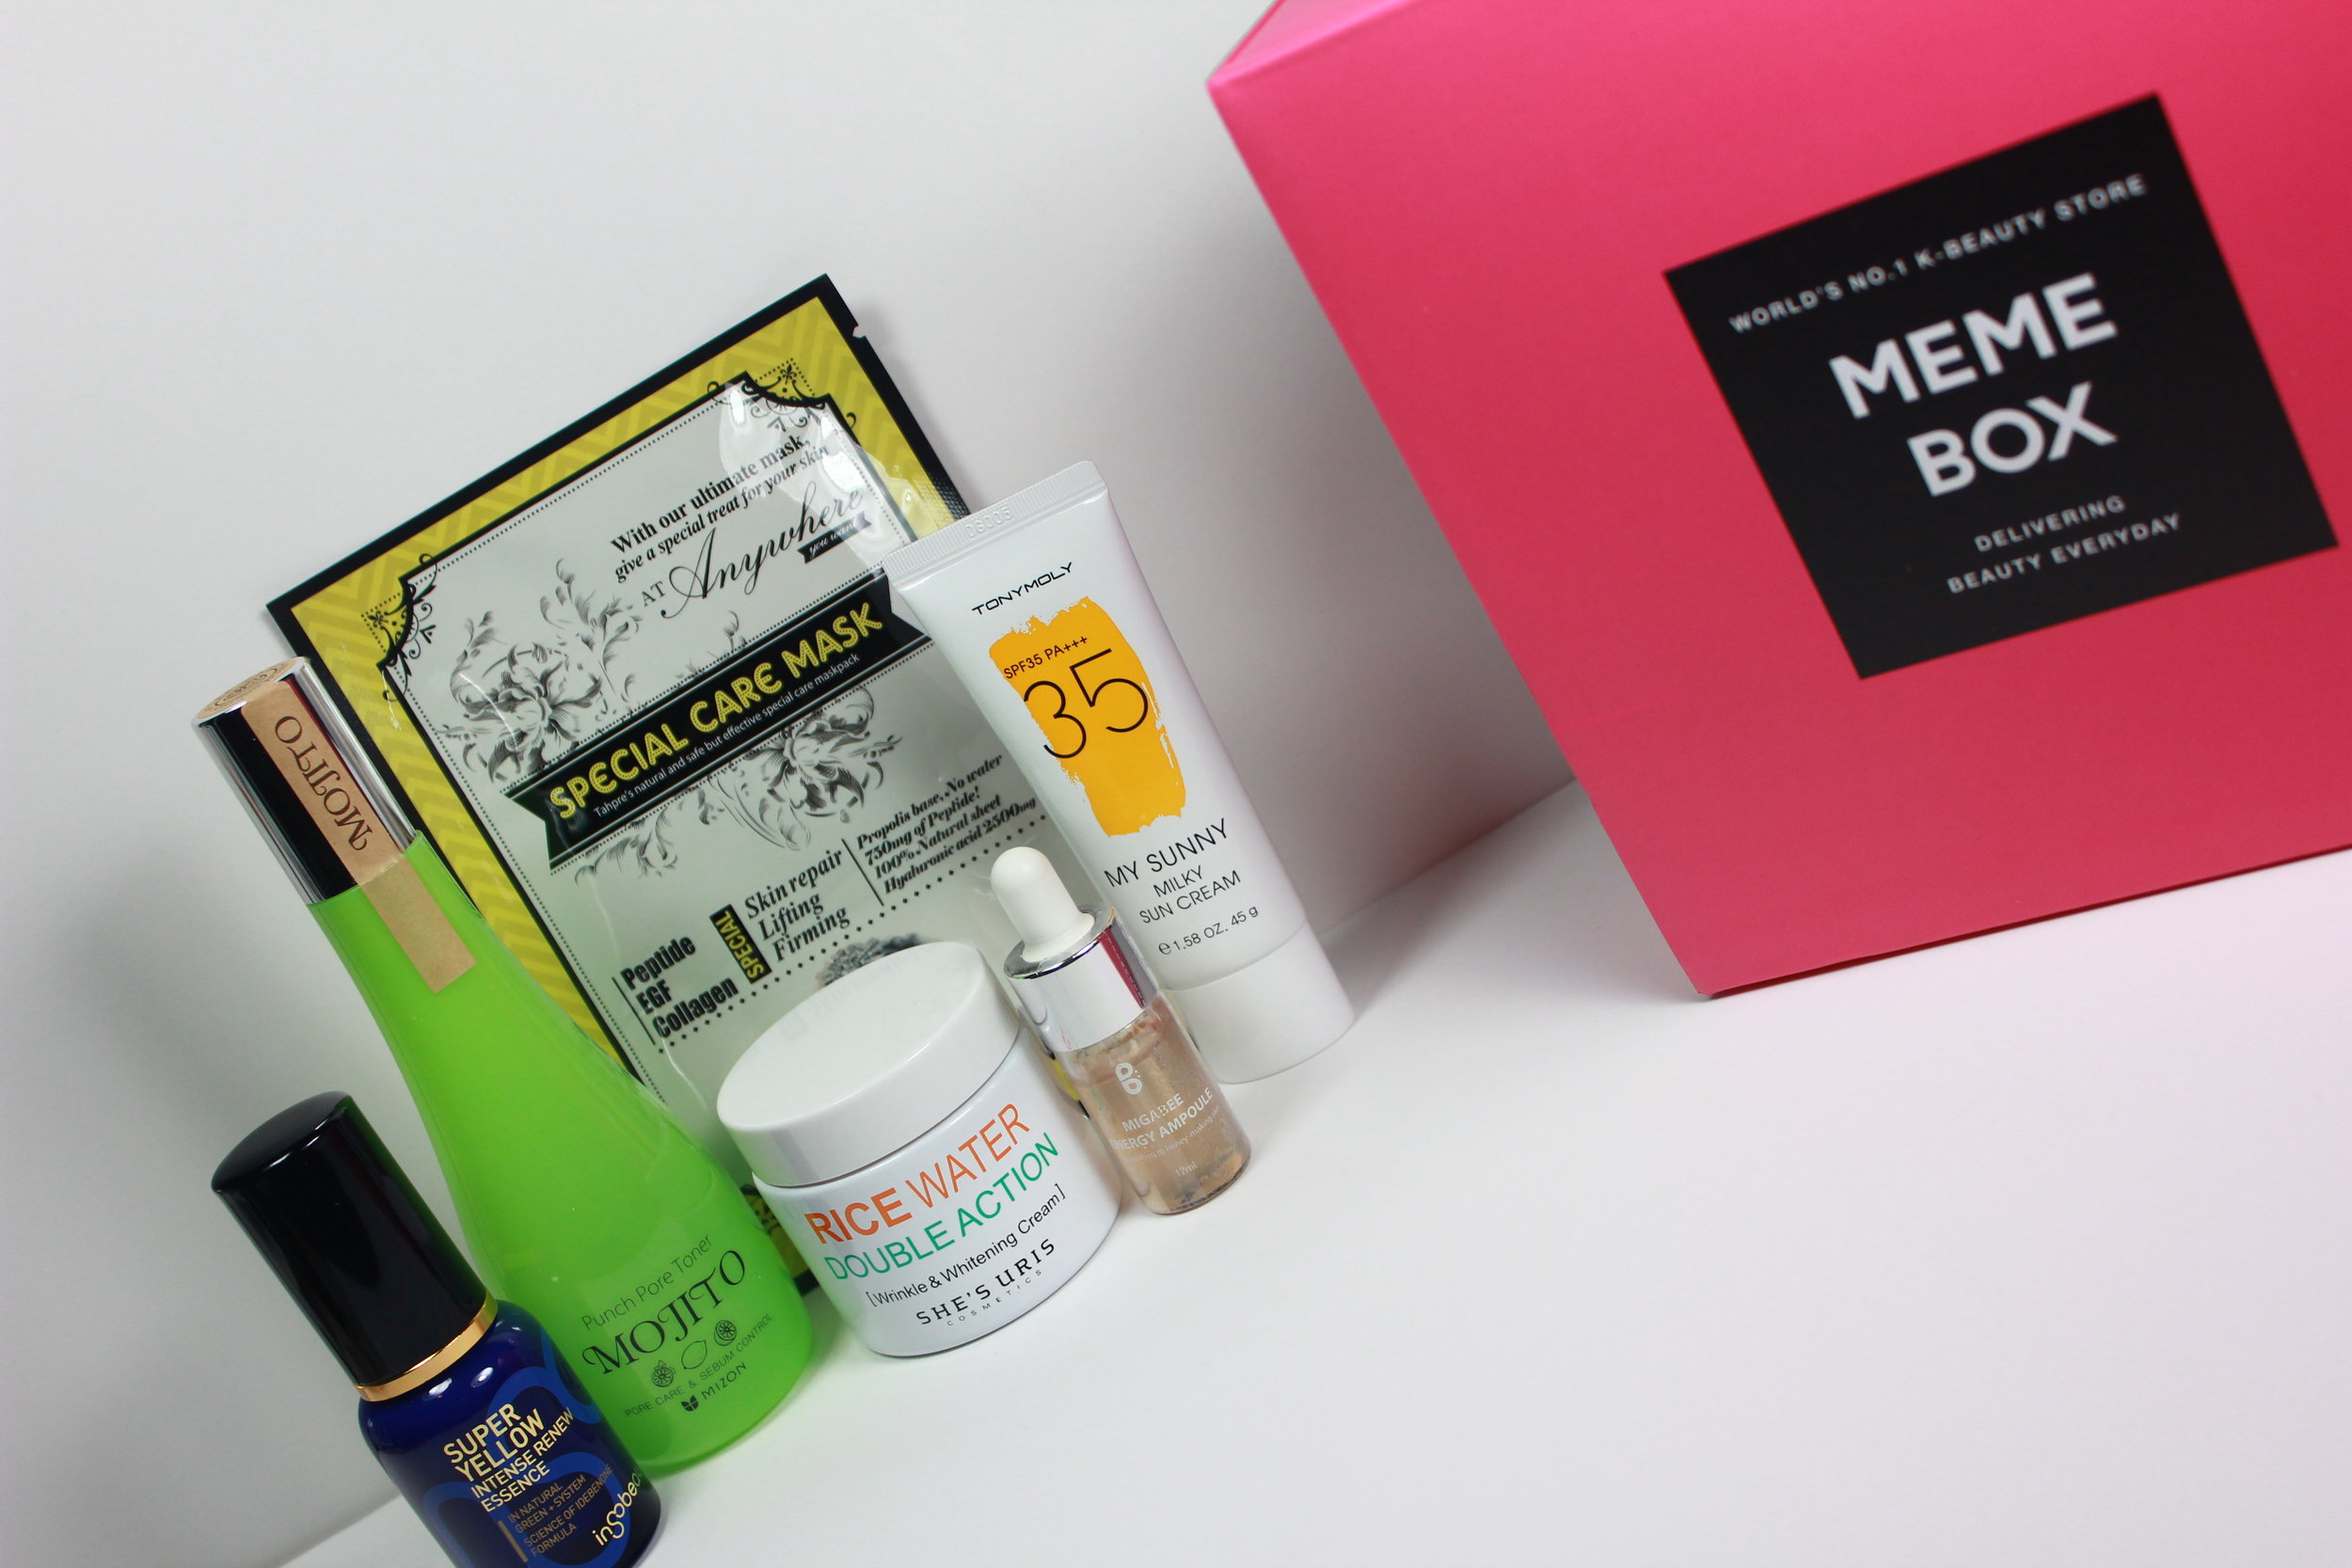 memebox skincare